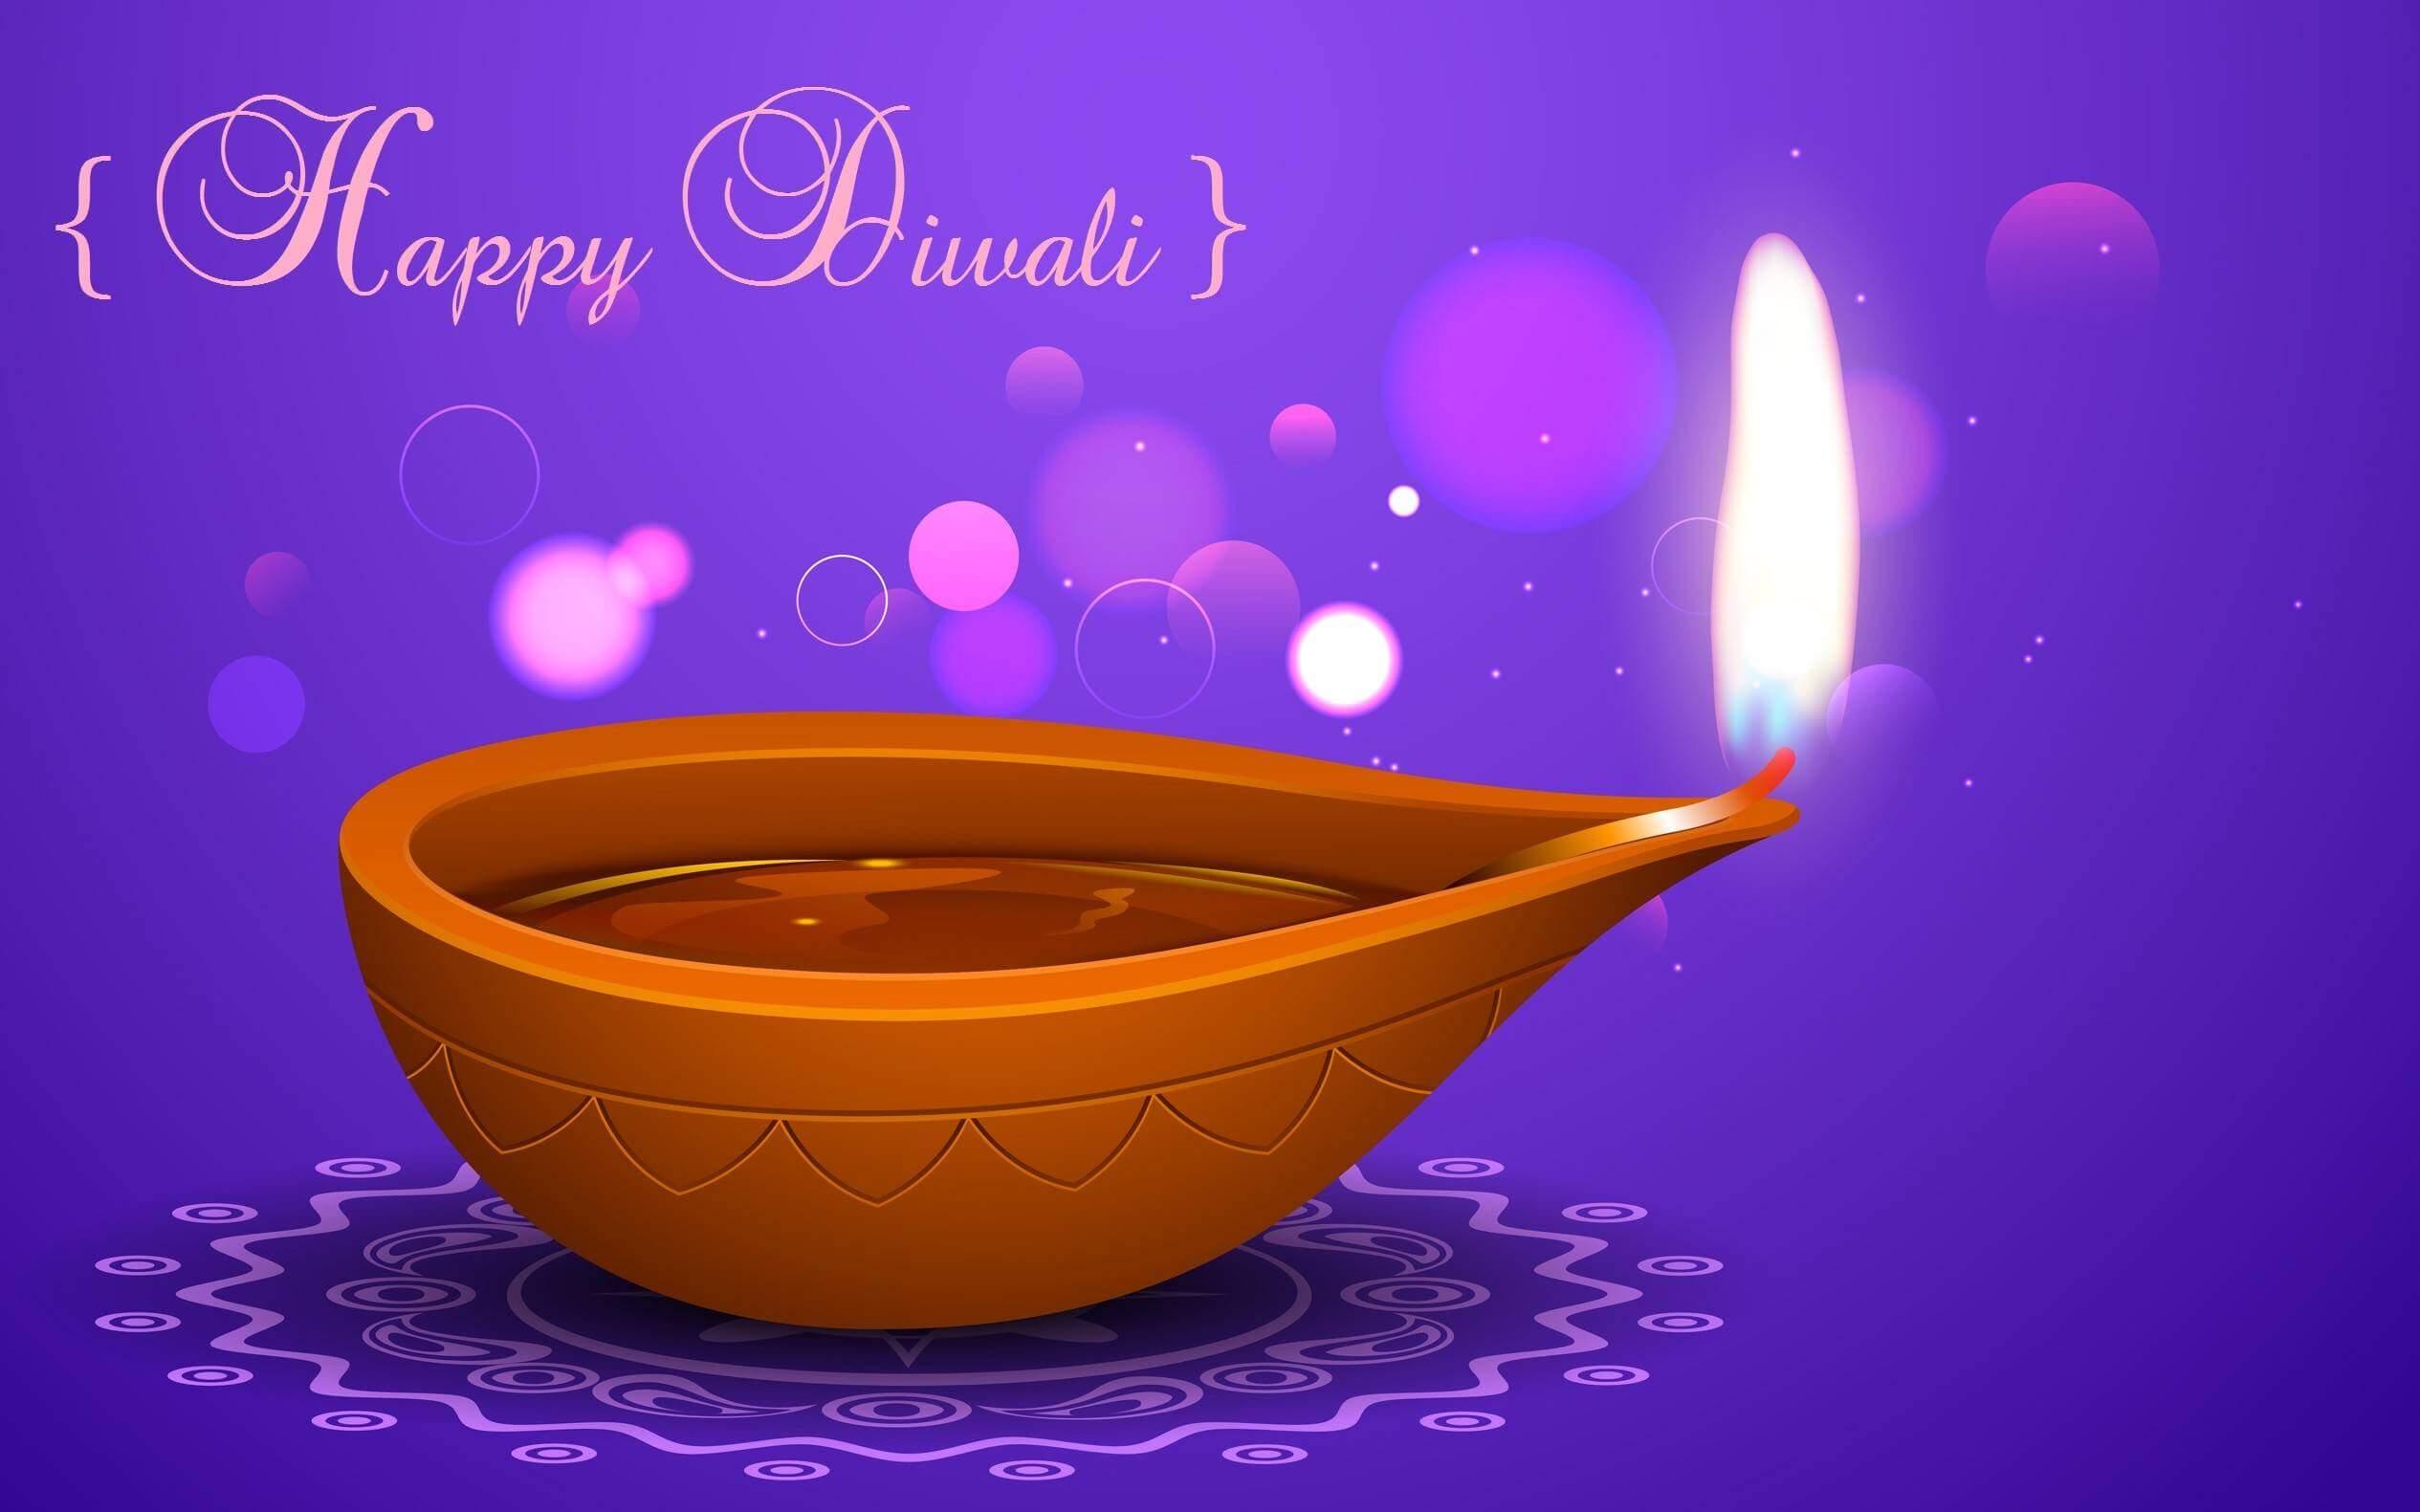 happy diwali wishes lamp graphic hd wallpaper